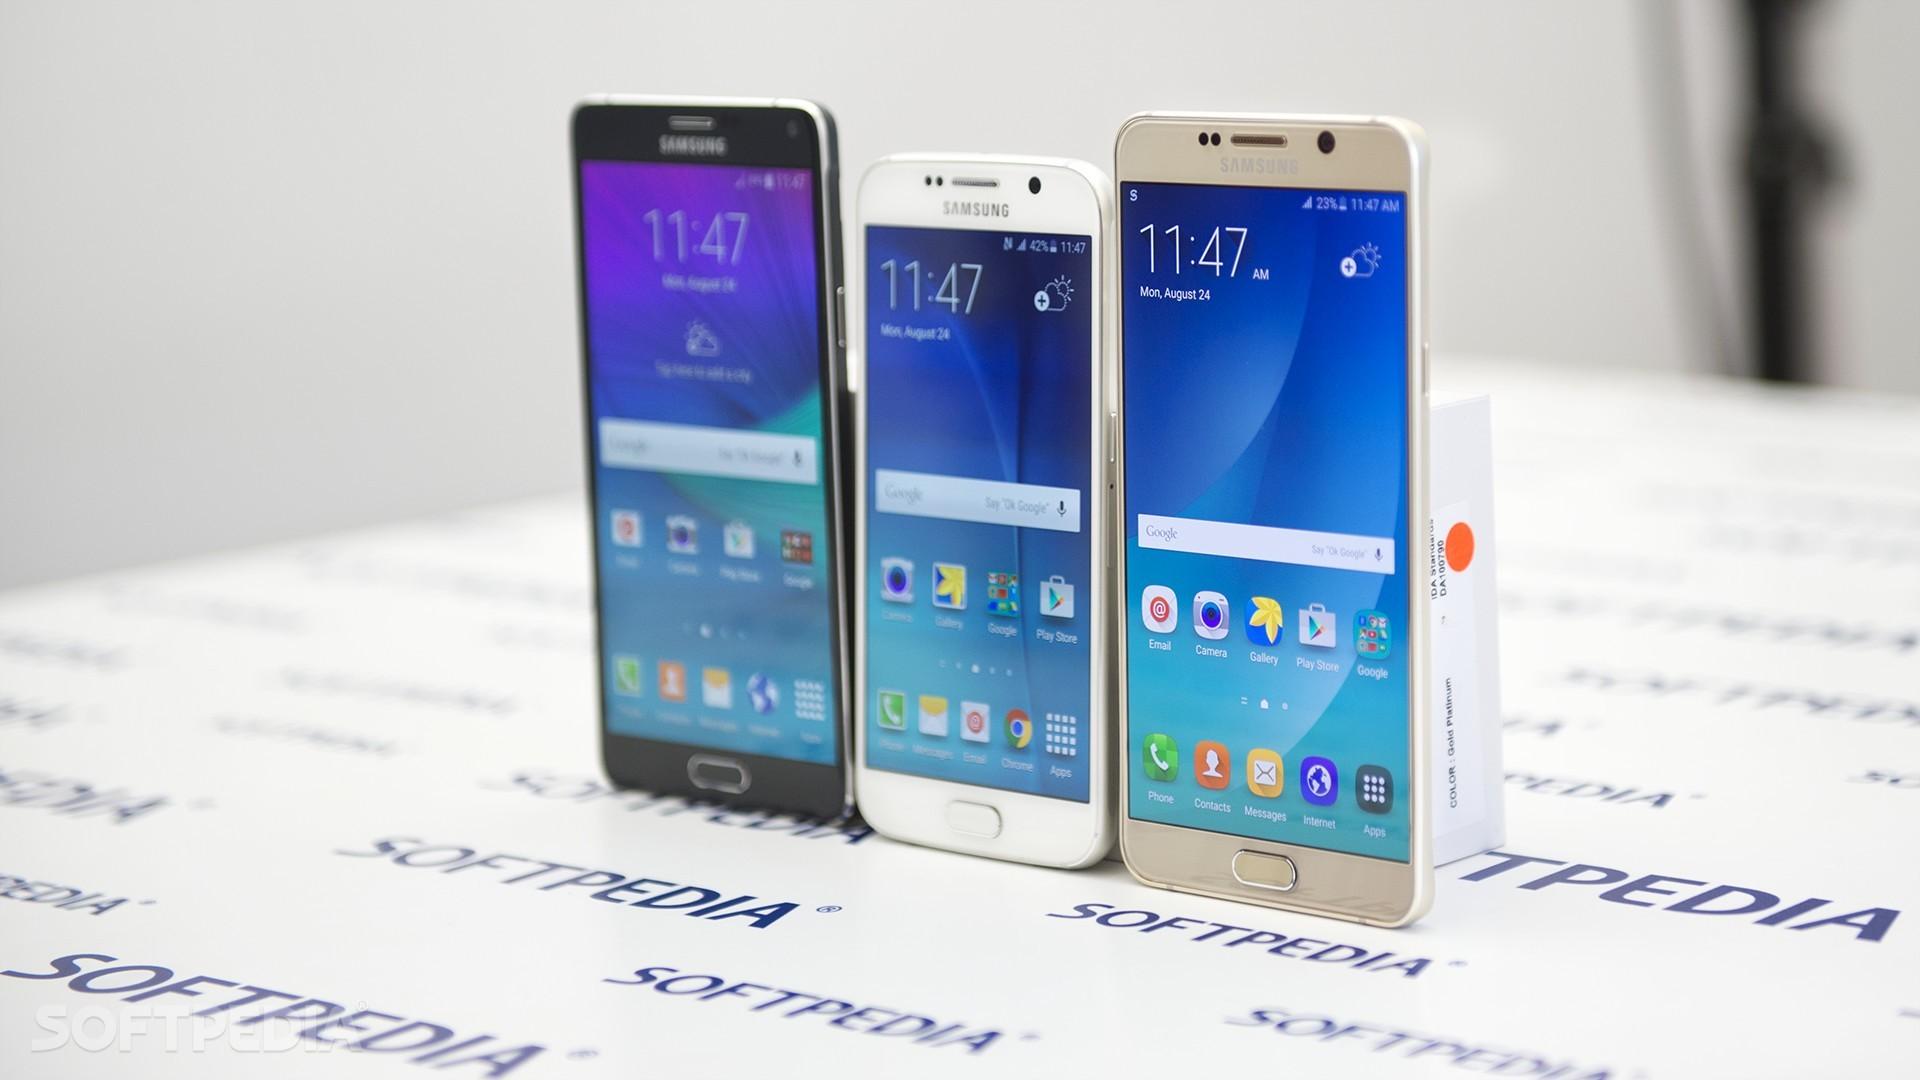 TAGS Codenames Crown Samsung Galaxy Series